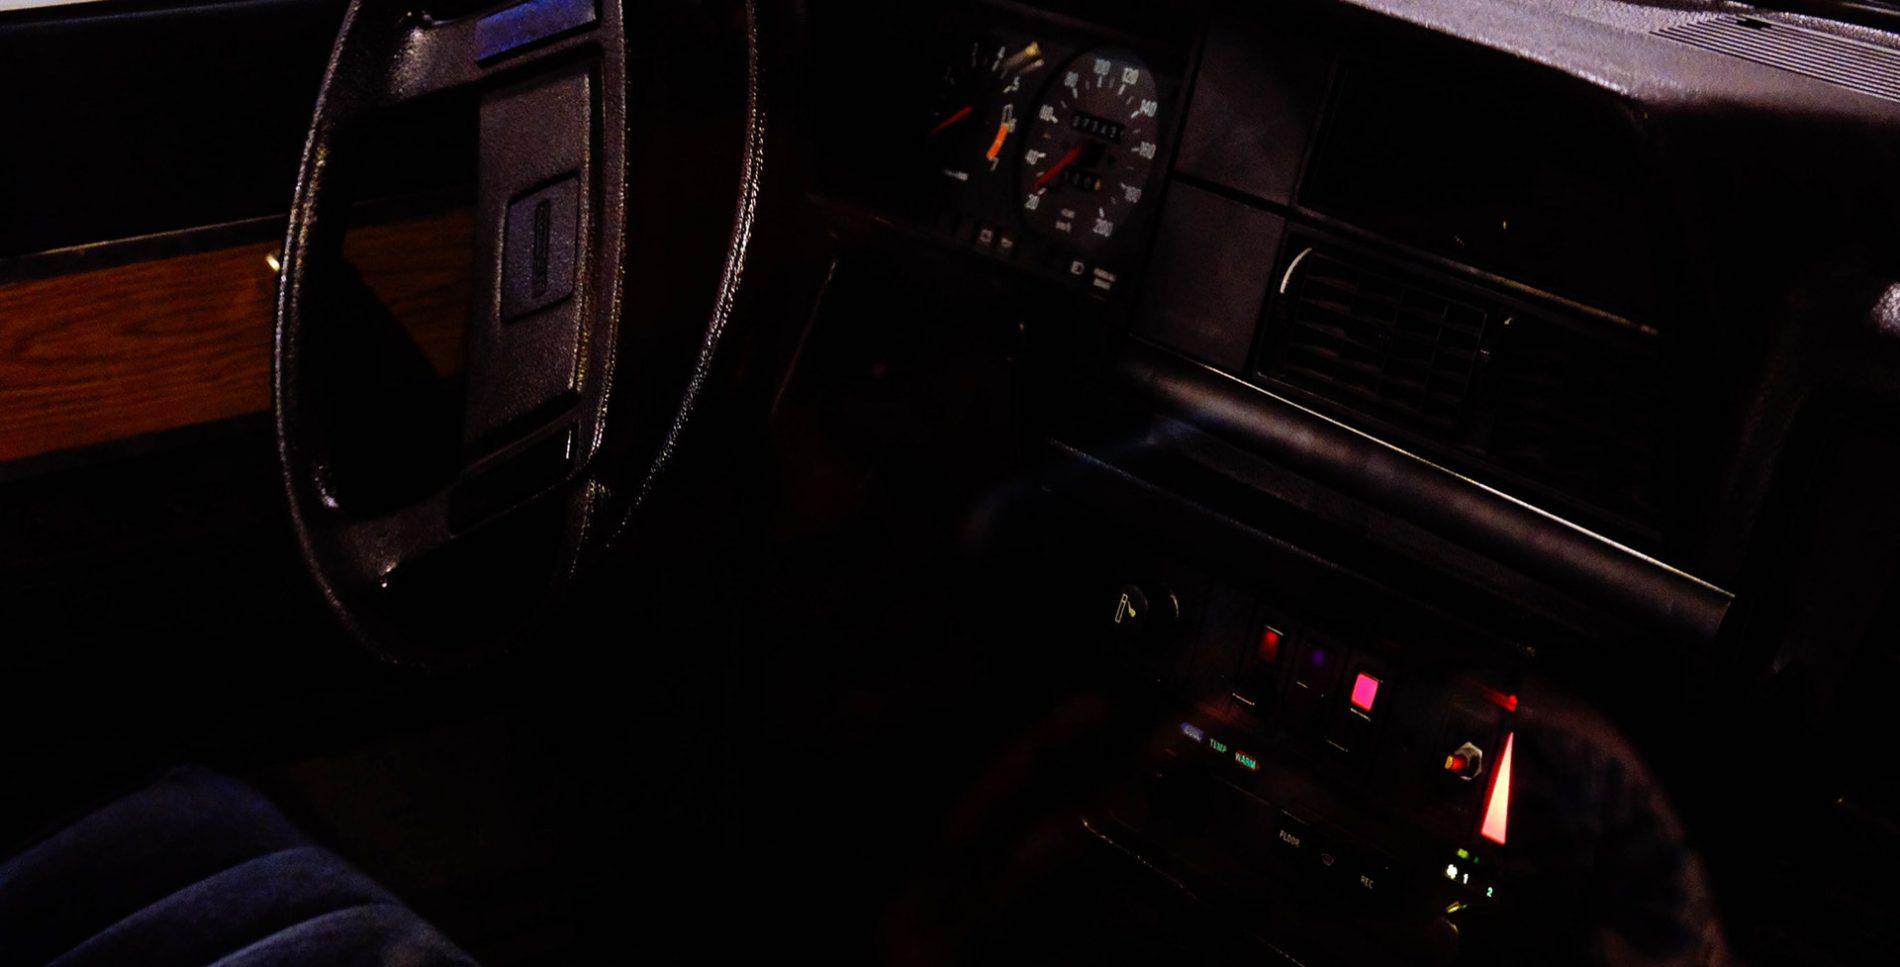 Interior of a stolen car retrieved in Australia